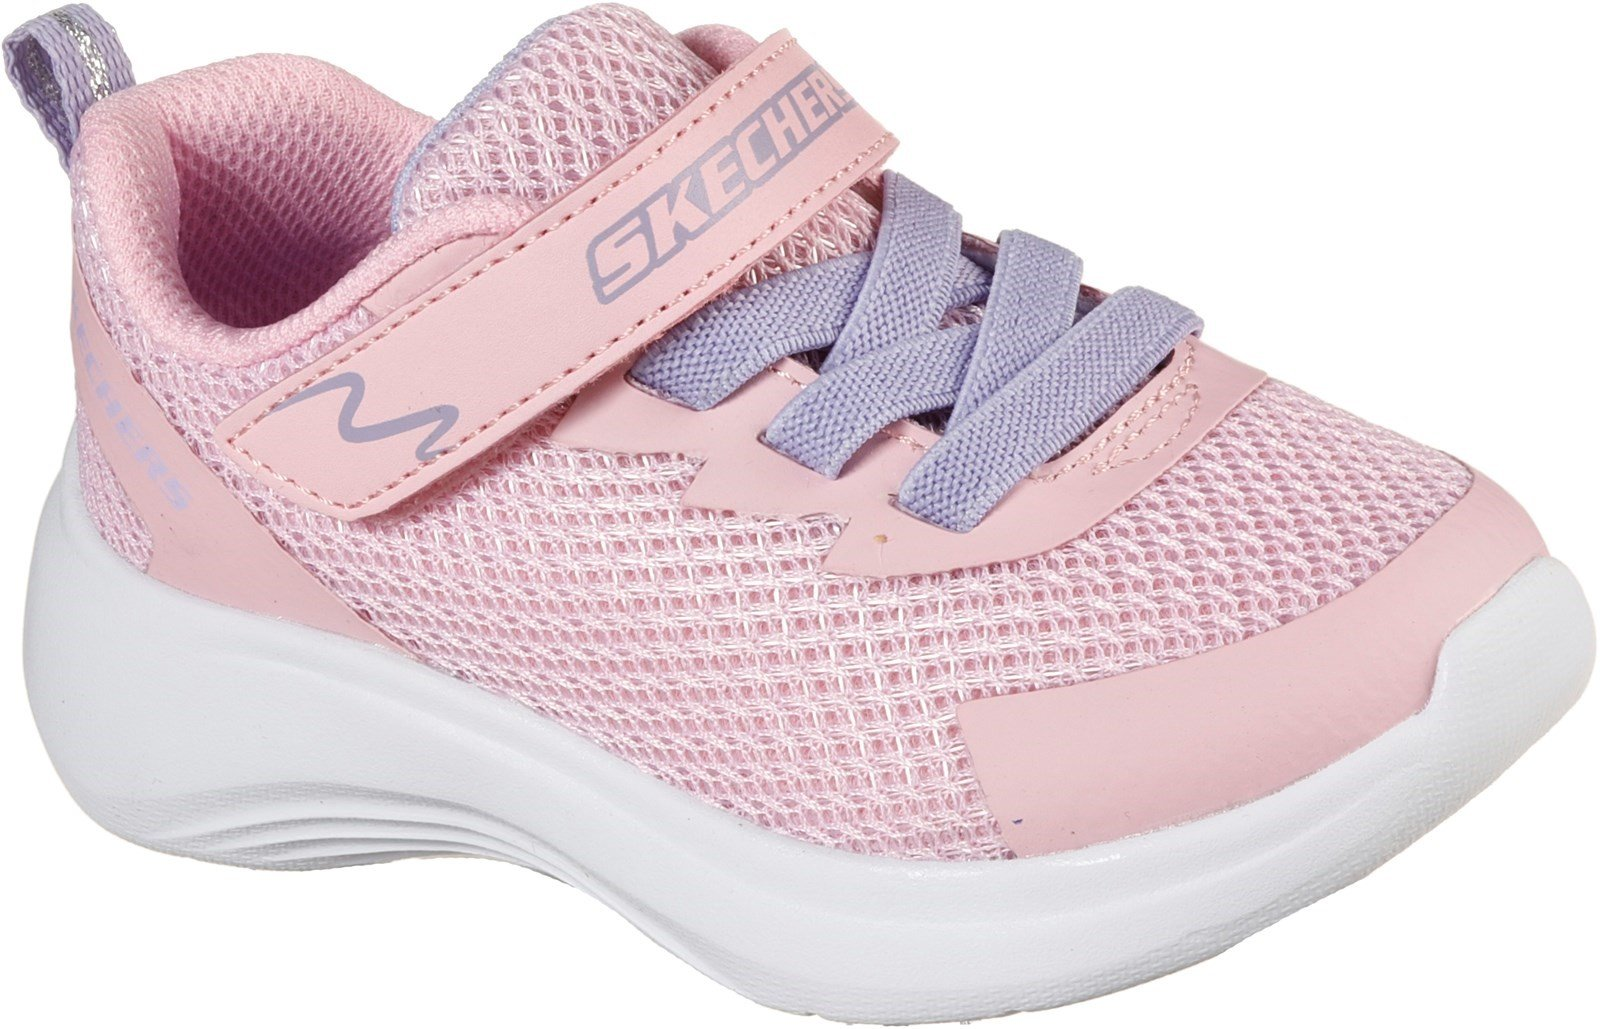 Skechers Kid's Selectors Sports Trainer Various Colours 32082 - Light Pink Mesh/Pink Trim 4